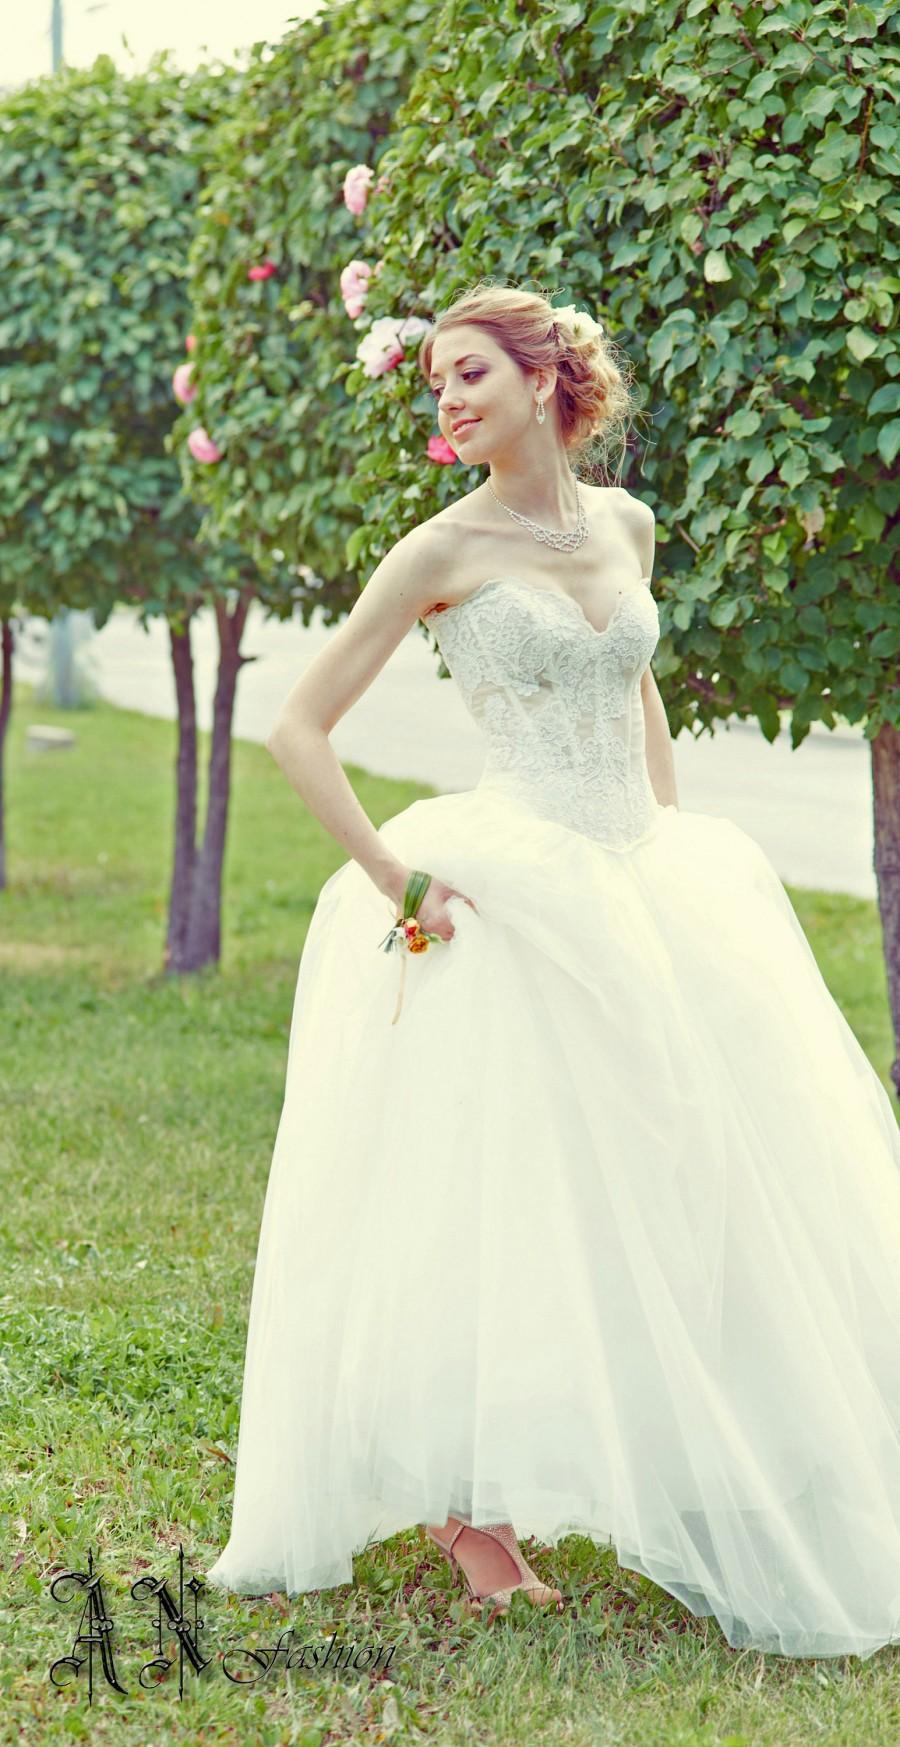 Princess wedding dress sweetheart bridal dress lace for Wedding dress free shipping